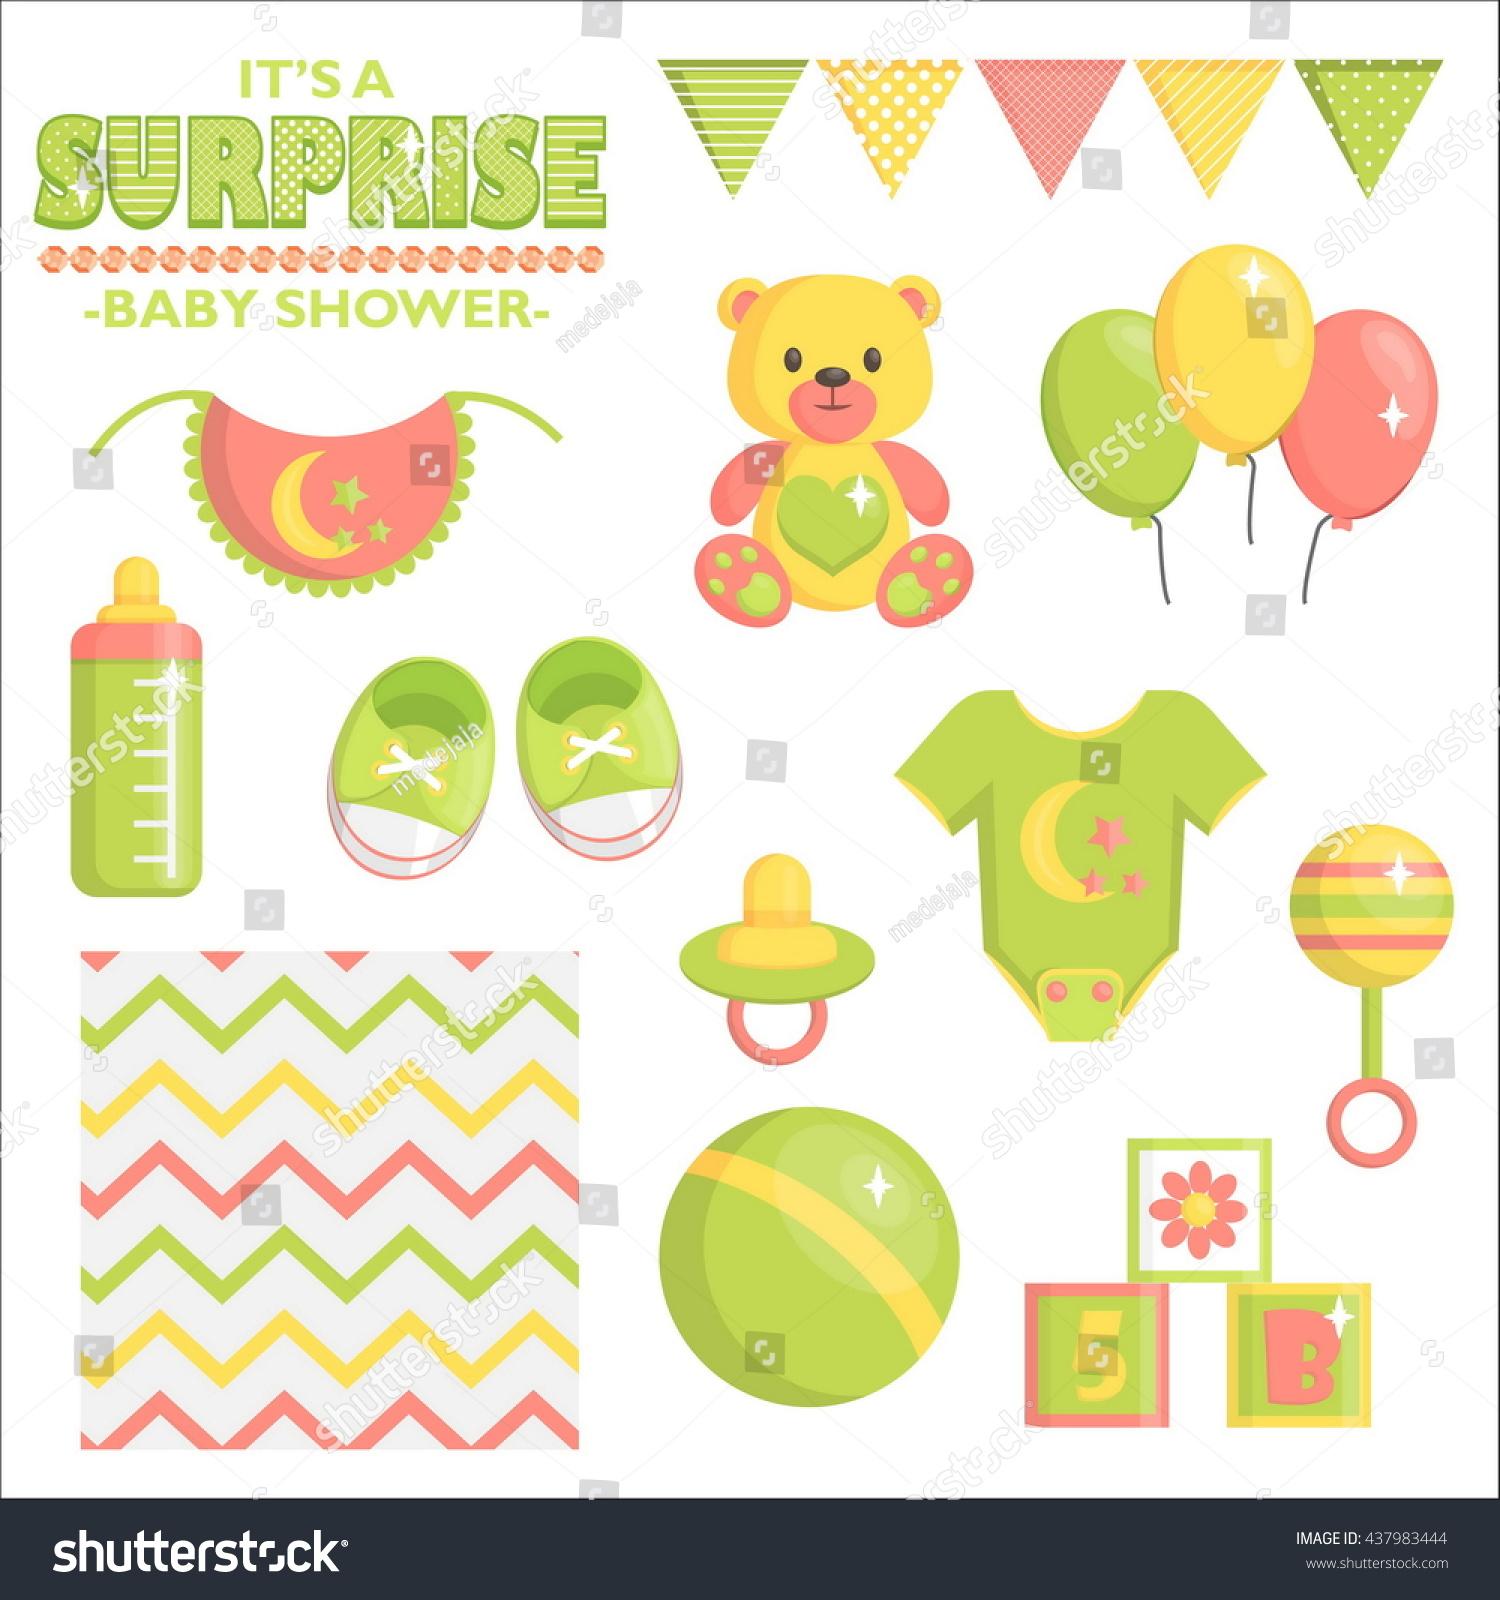 Surprise Baby Shower Home Design Ideas